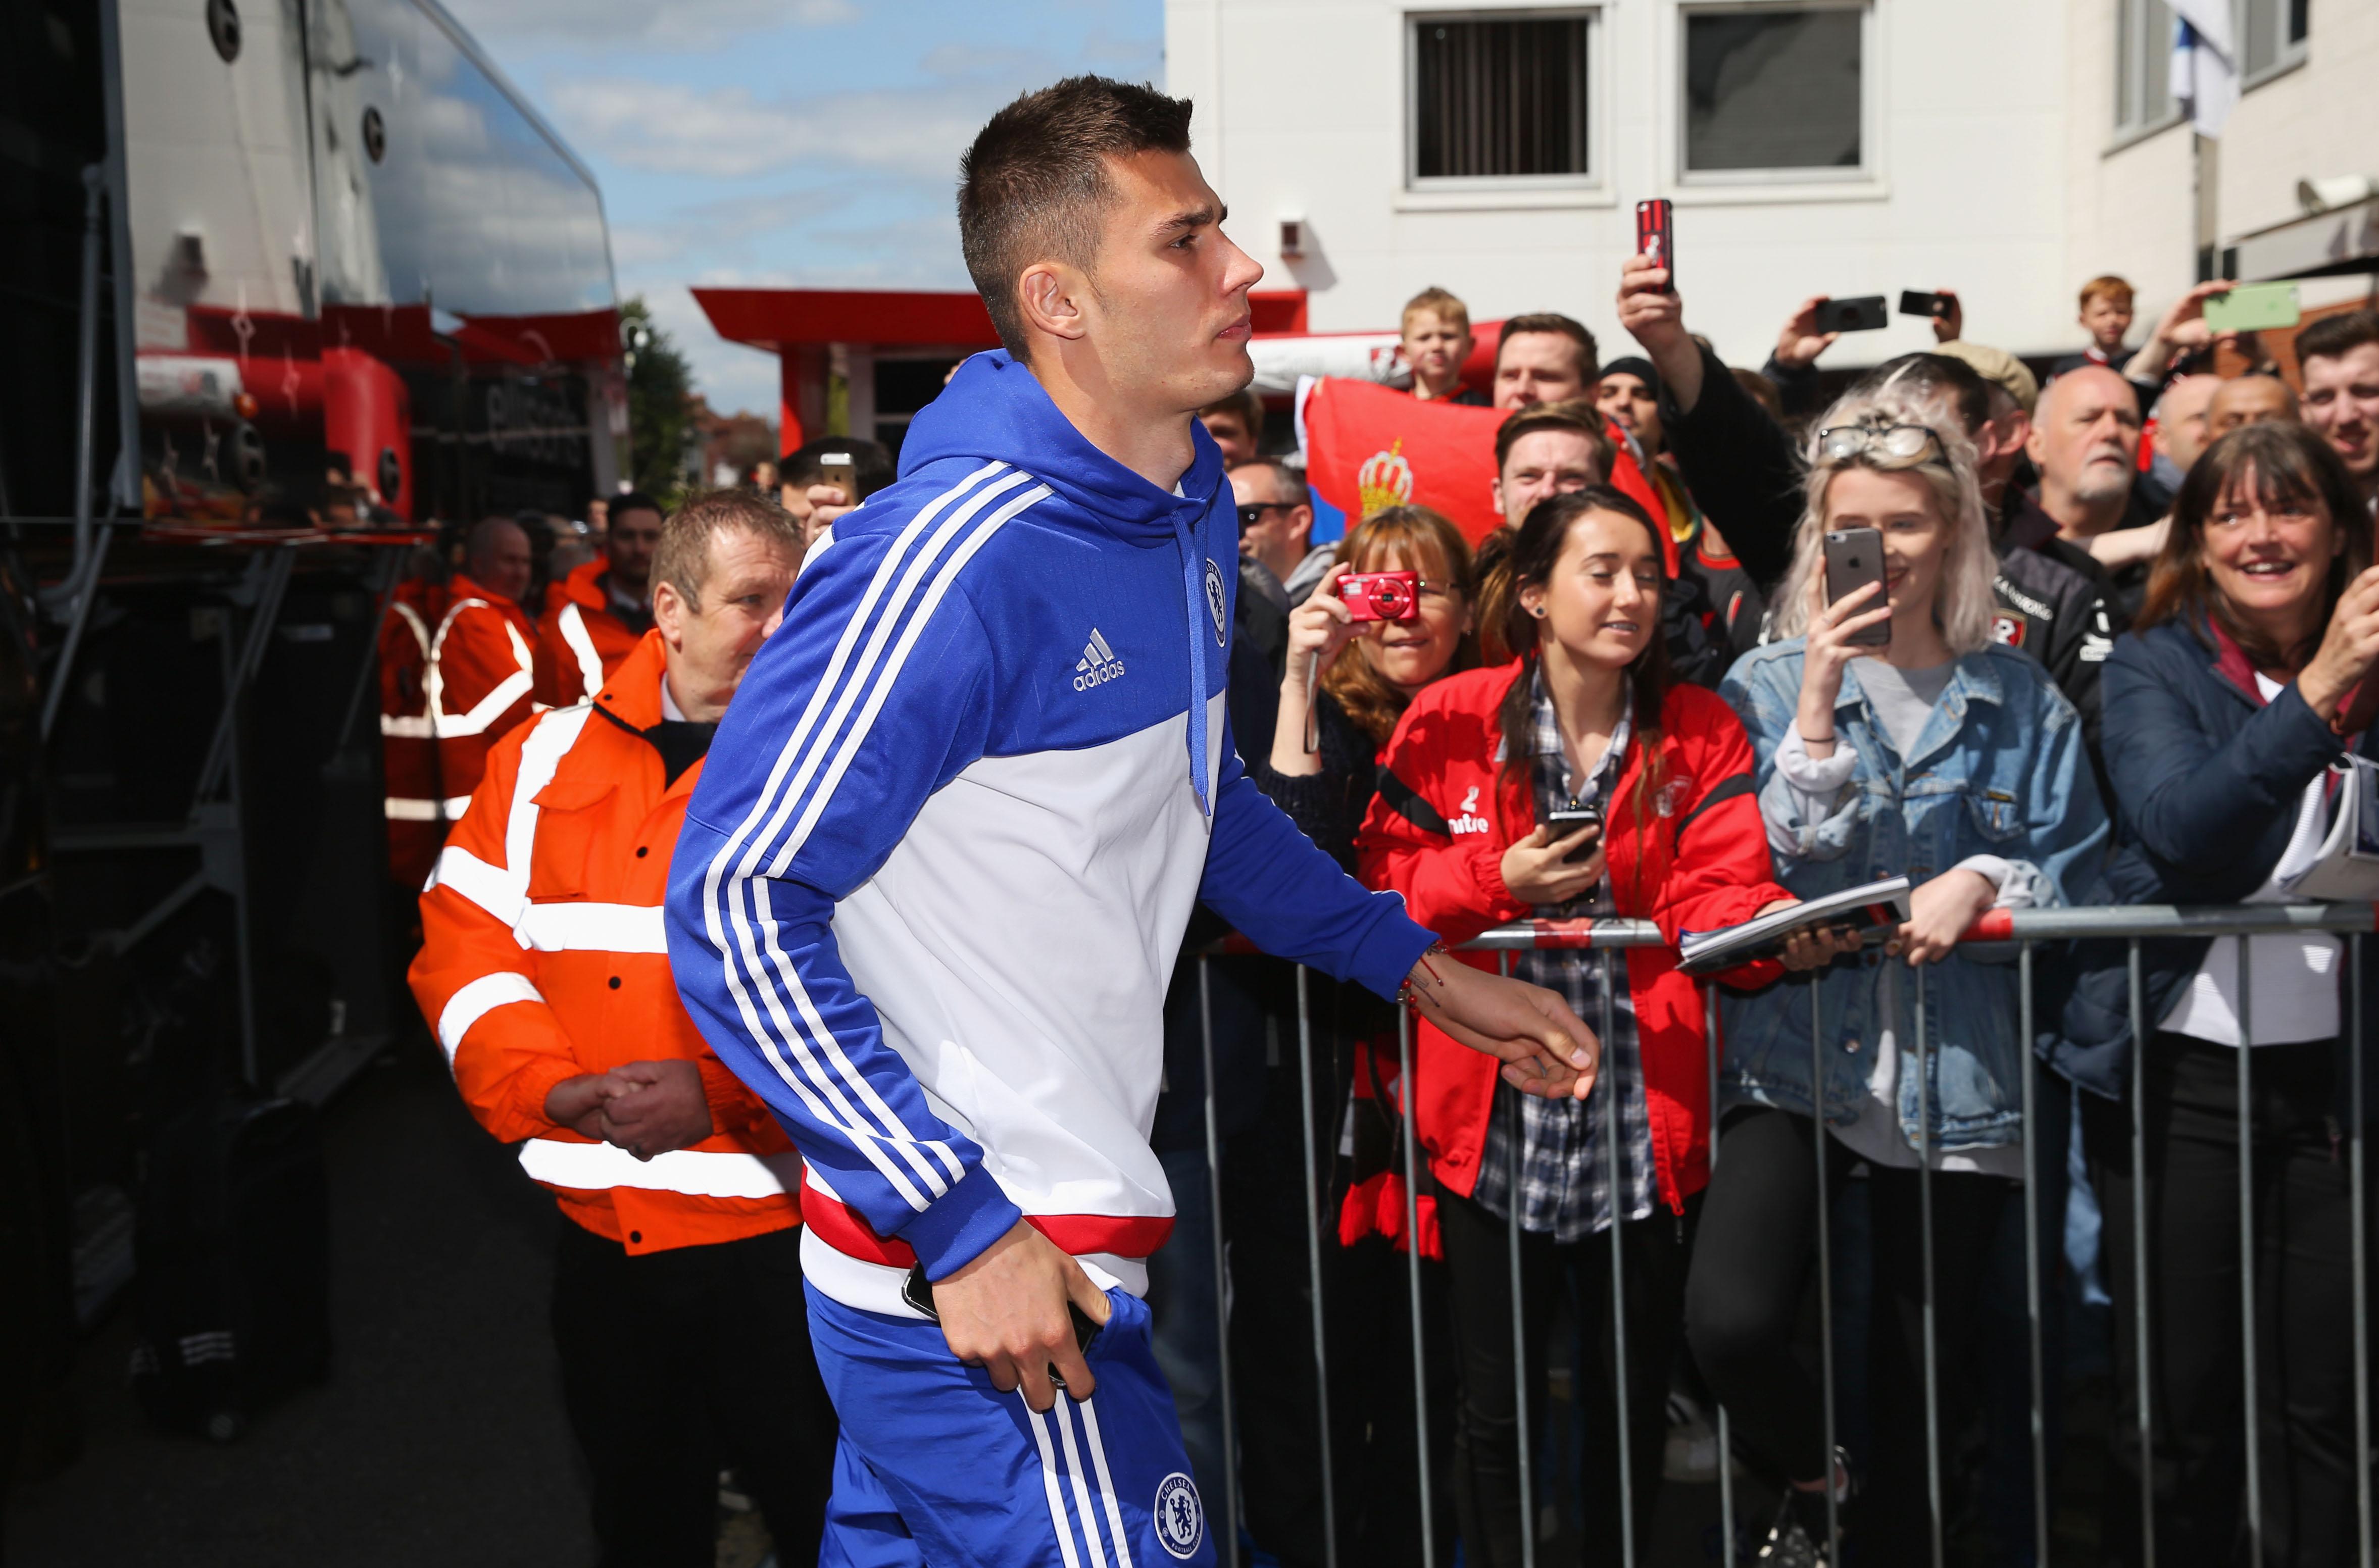 Chelsea loanee Matt Miazga accused of faking injury to flee from Nantes